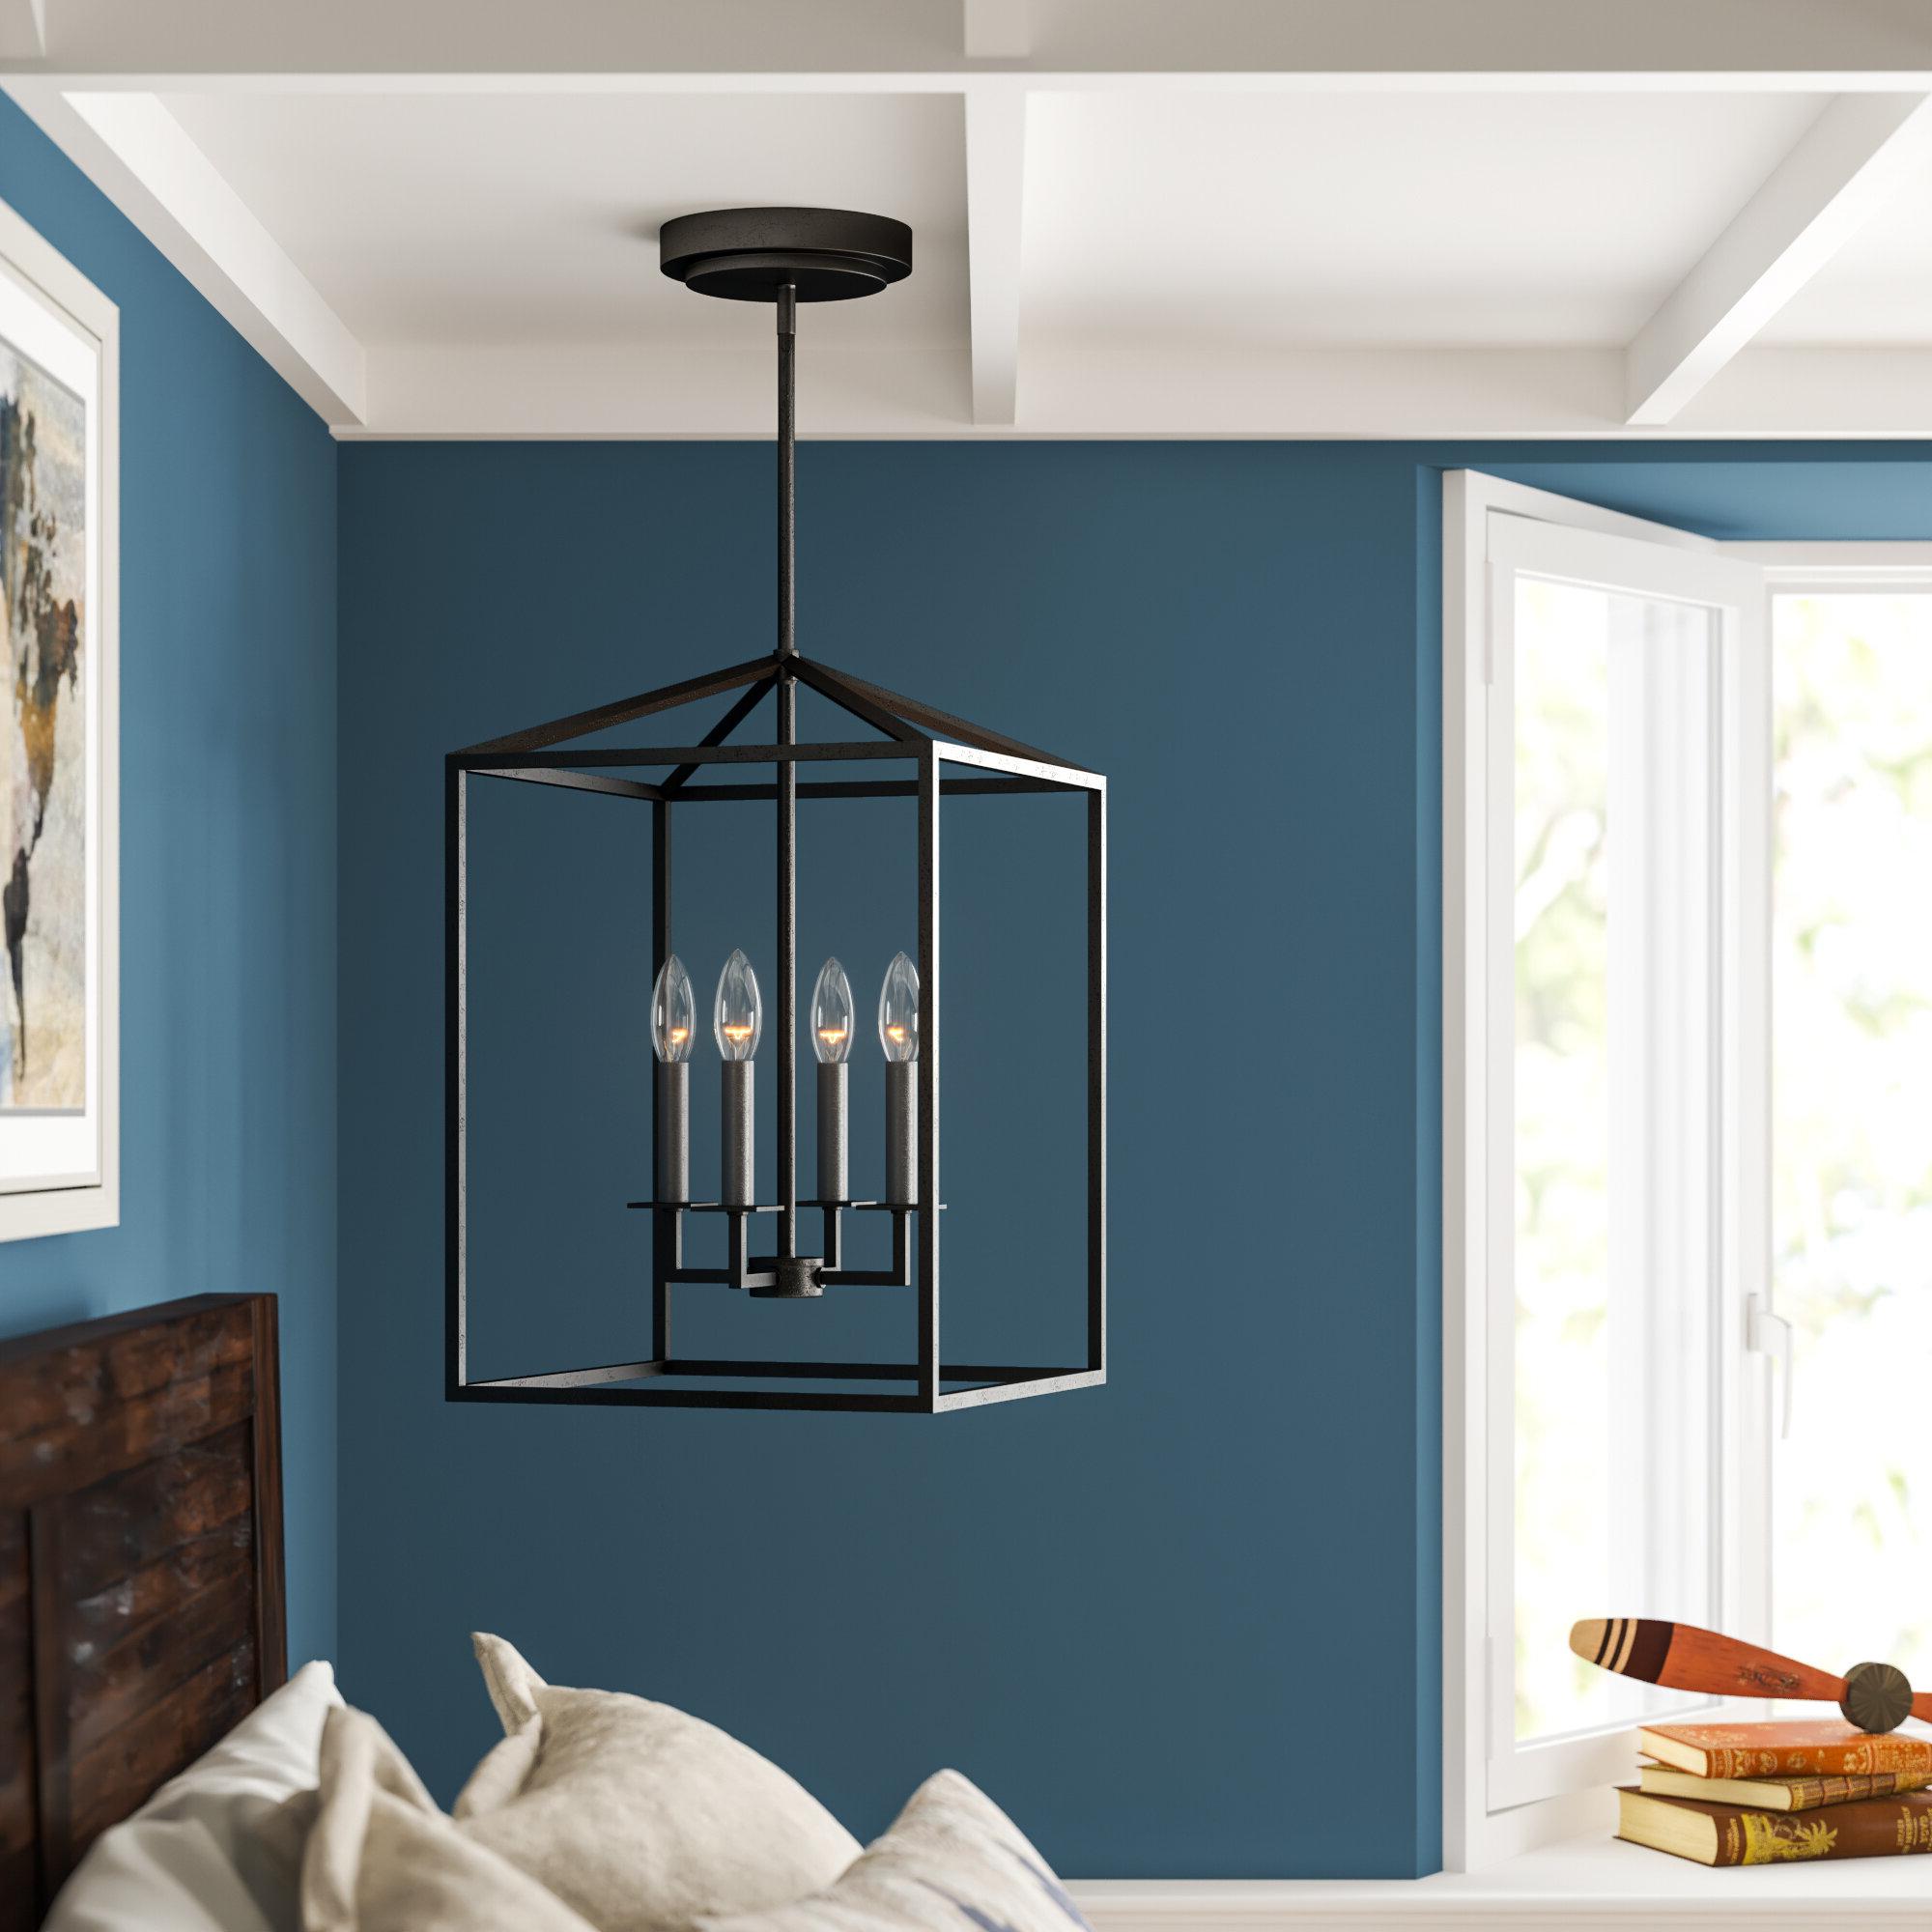 Odie 4 Light Lantern Square/rectangle Pendant In Well Liked Varnum 4 Light Lantern Pendants (View 11 of 25)